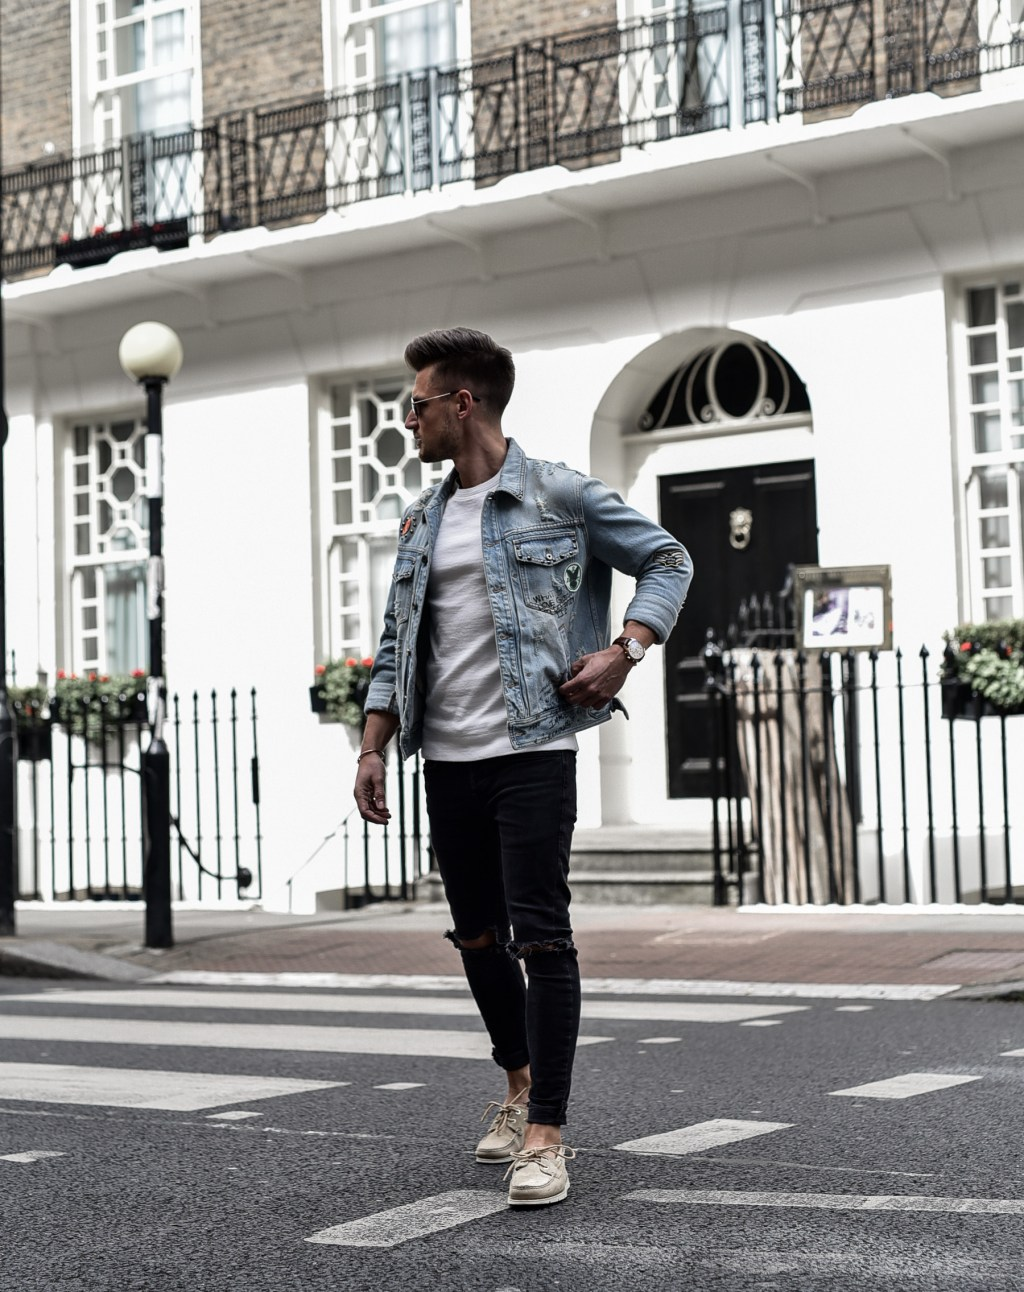 Tommeezjerry-Maennermodeblog-Maennermode-Fashionblog-Styleblog-Berlinblog-Mensblog-Timberland-Boatshoes-Venice-London-Casual-Chick-Streetstyle-Gentlemenstyle